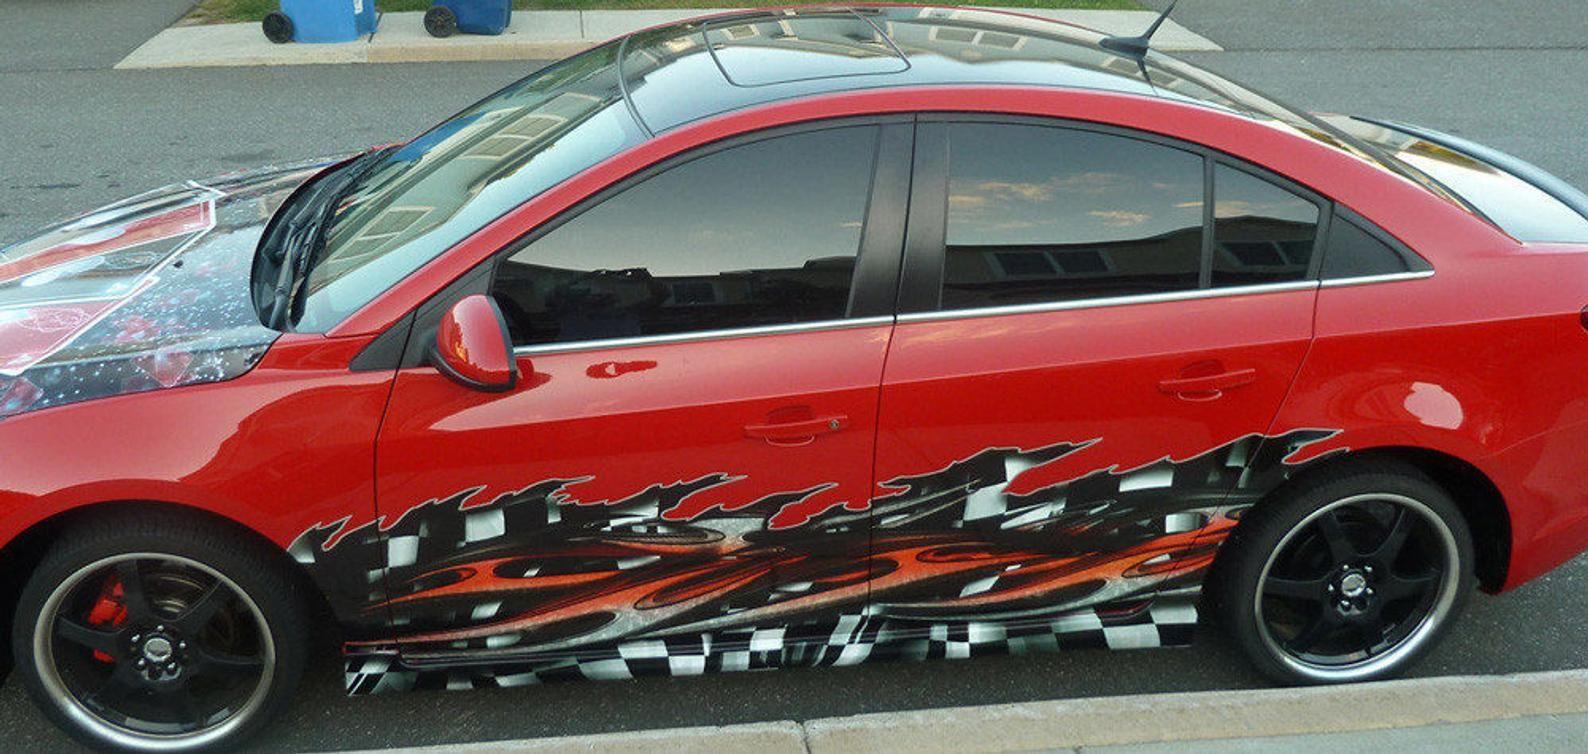 Tribal Checkered Flag Car Racing Vinyl Wrap Kit Etsy Checkered Flag Car Decals Vinyl Car [ 754 x 1588 Pixel ]